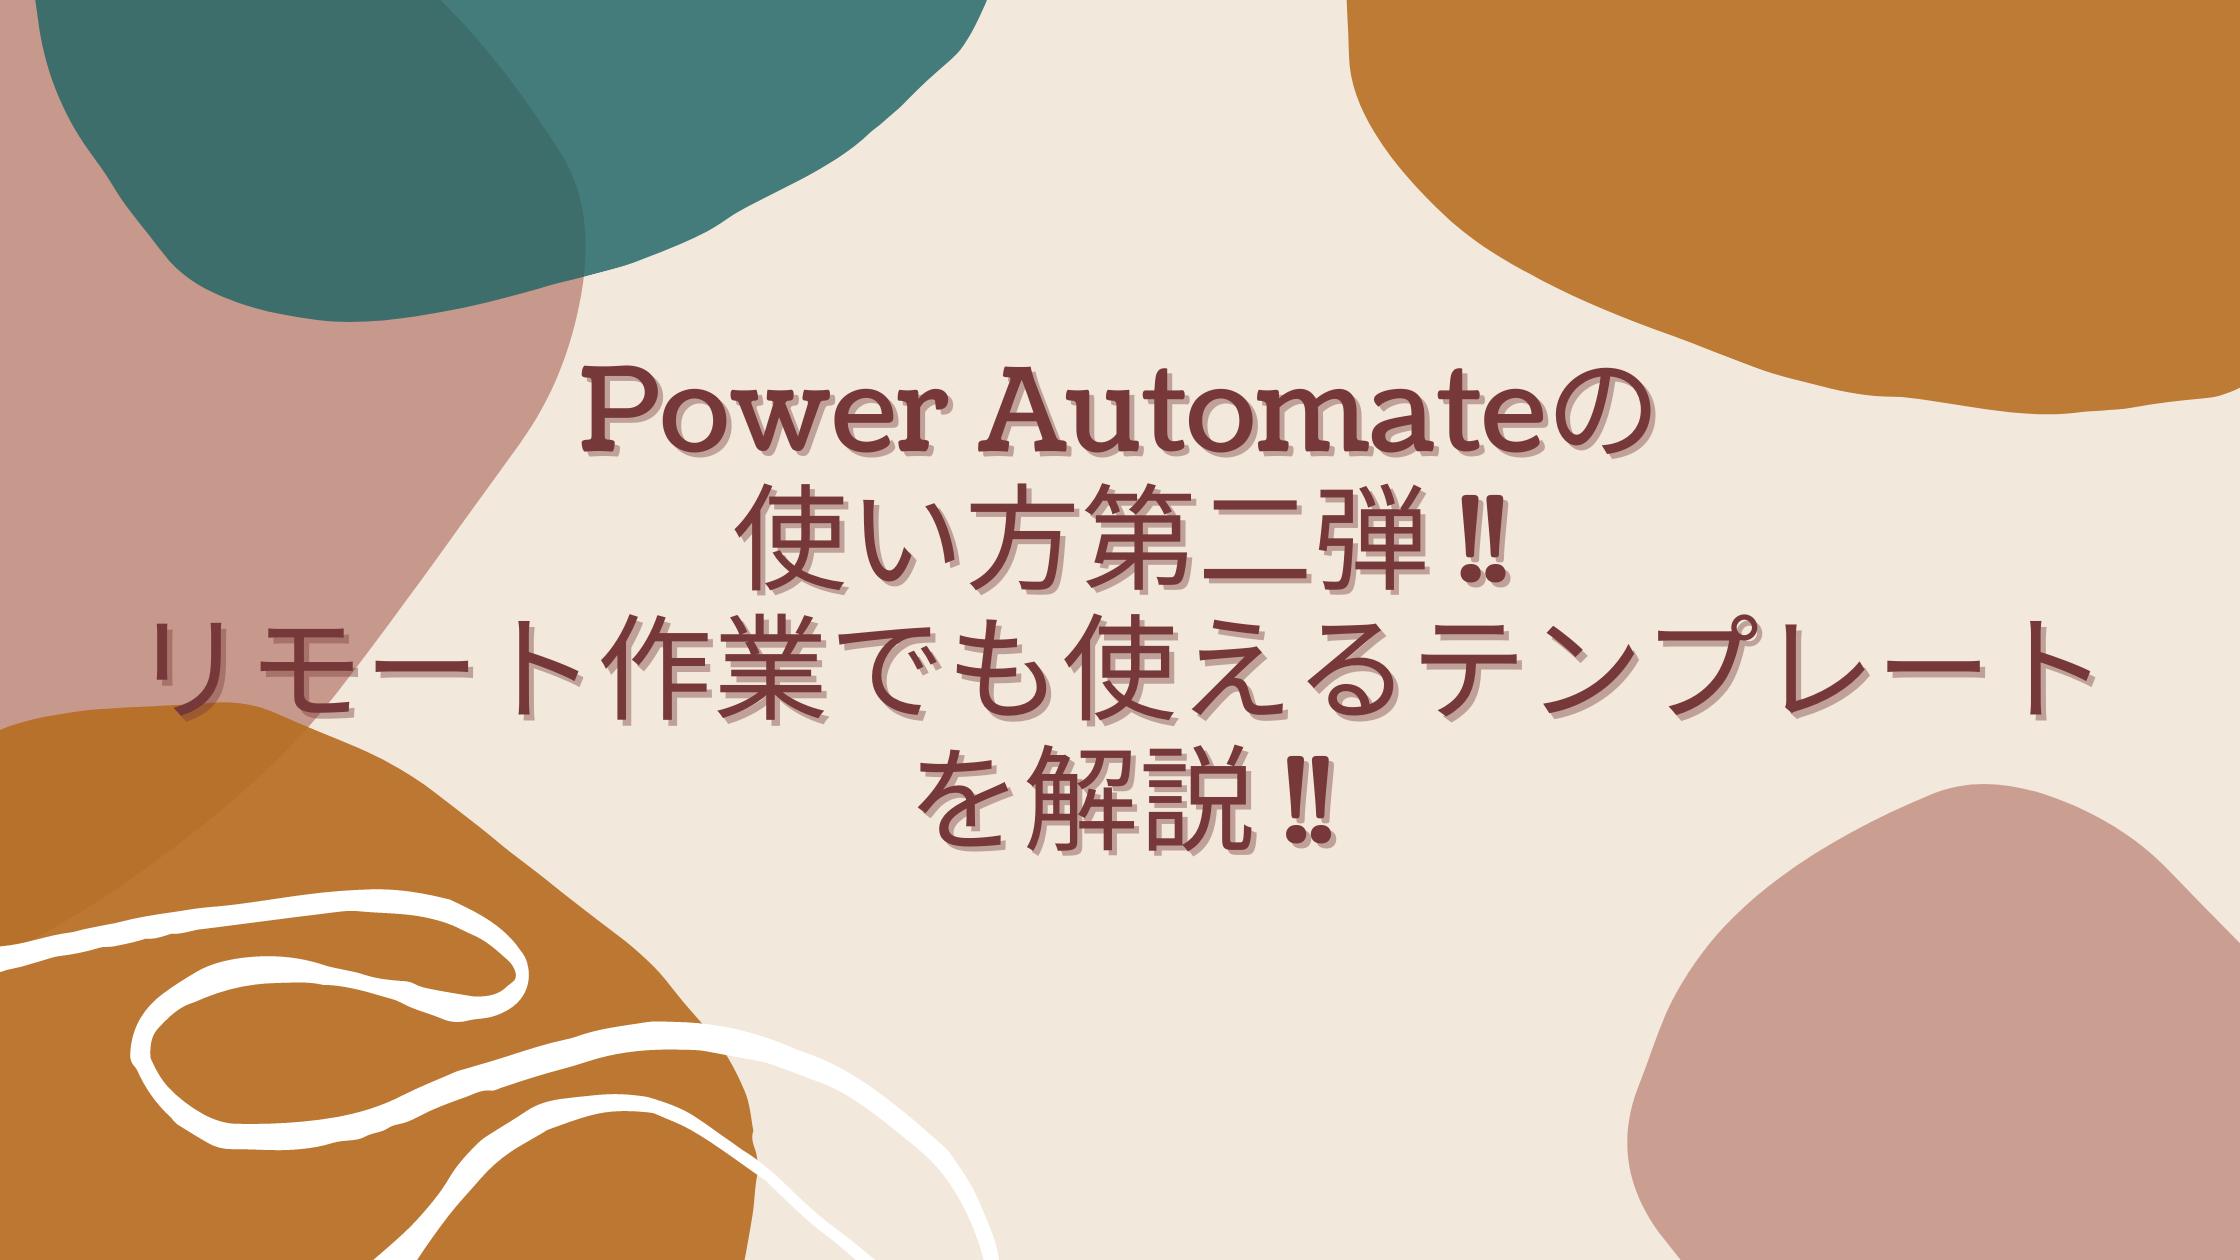 Power Automateの使い方第2弾!リモート作業でも使えるテンプレートを初心者にもわかりやすく簡単に解説!